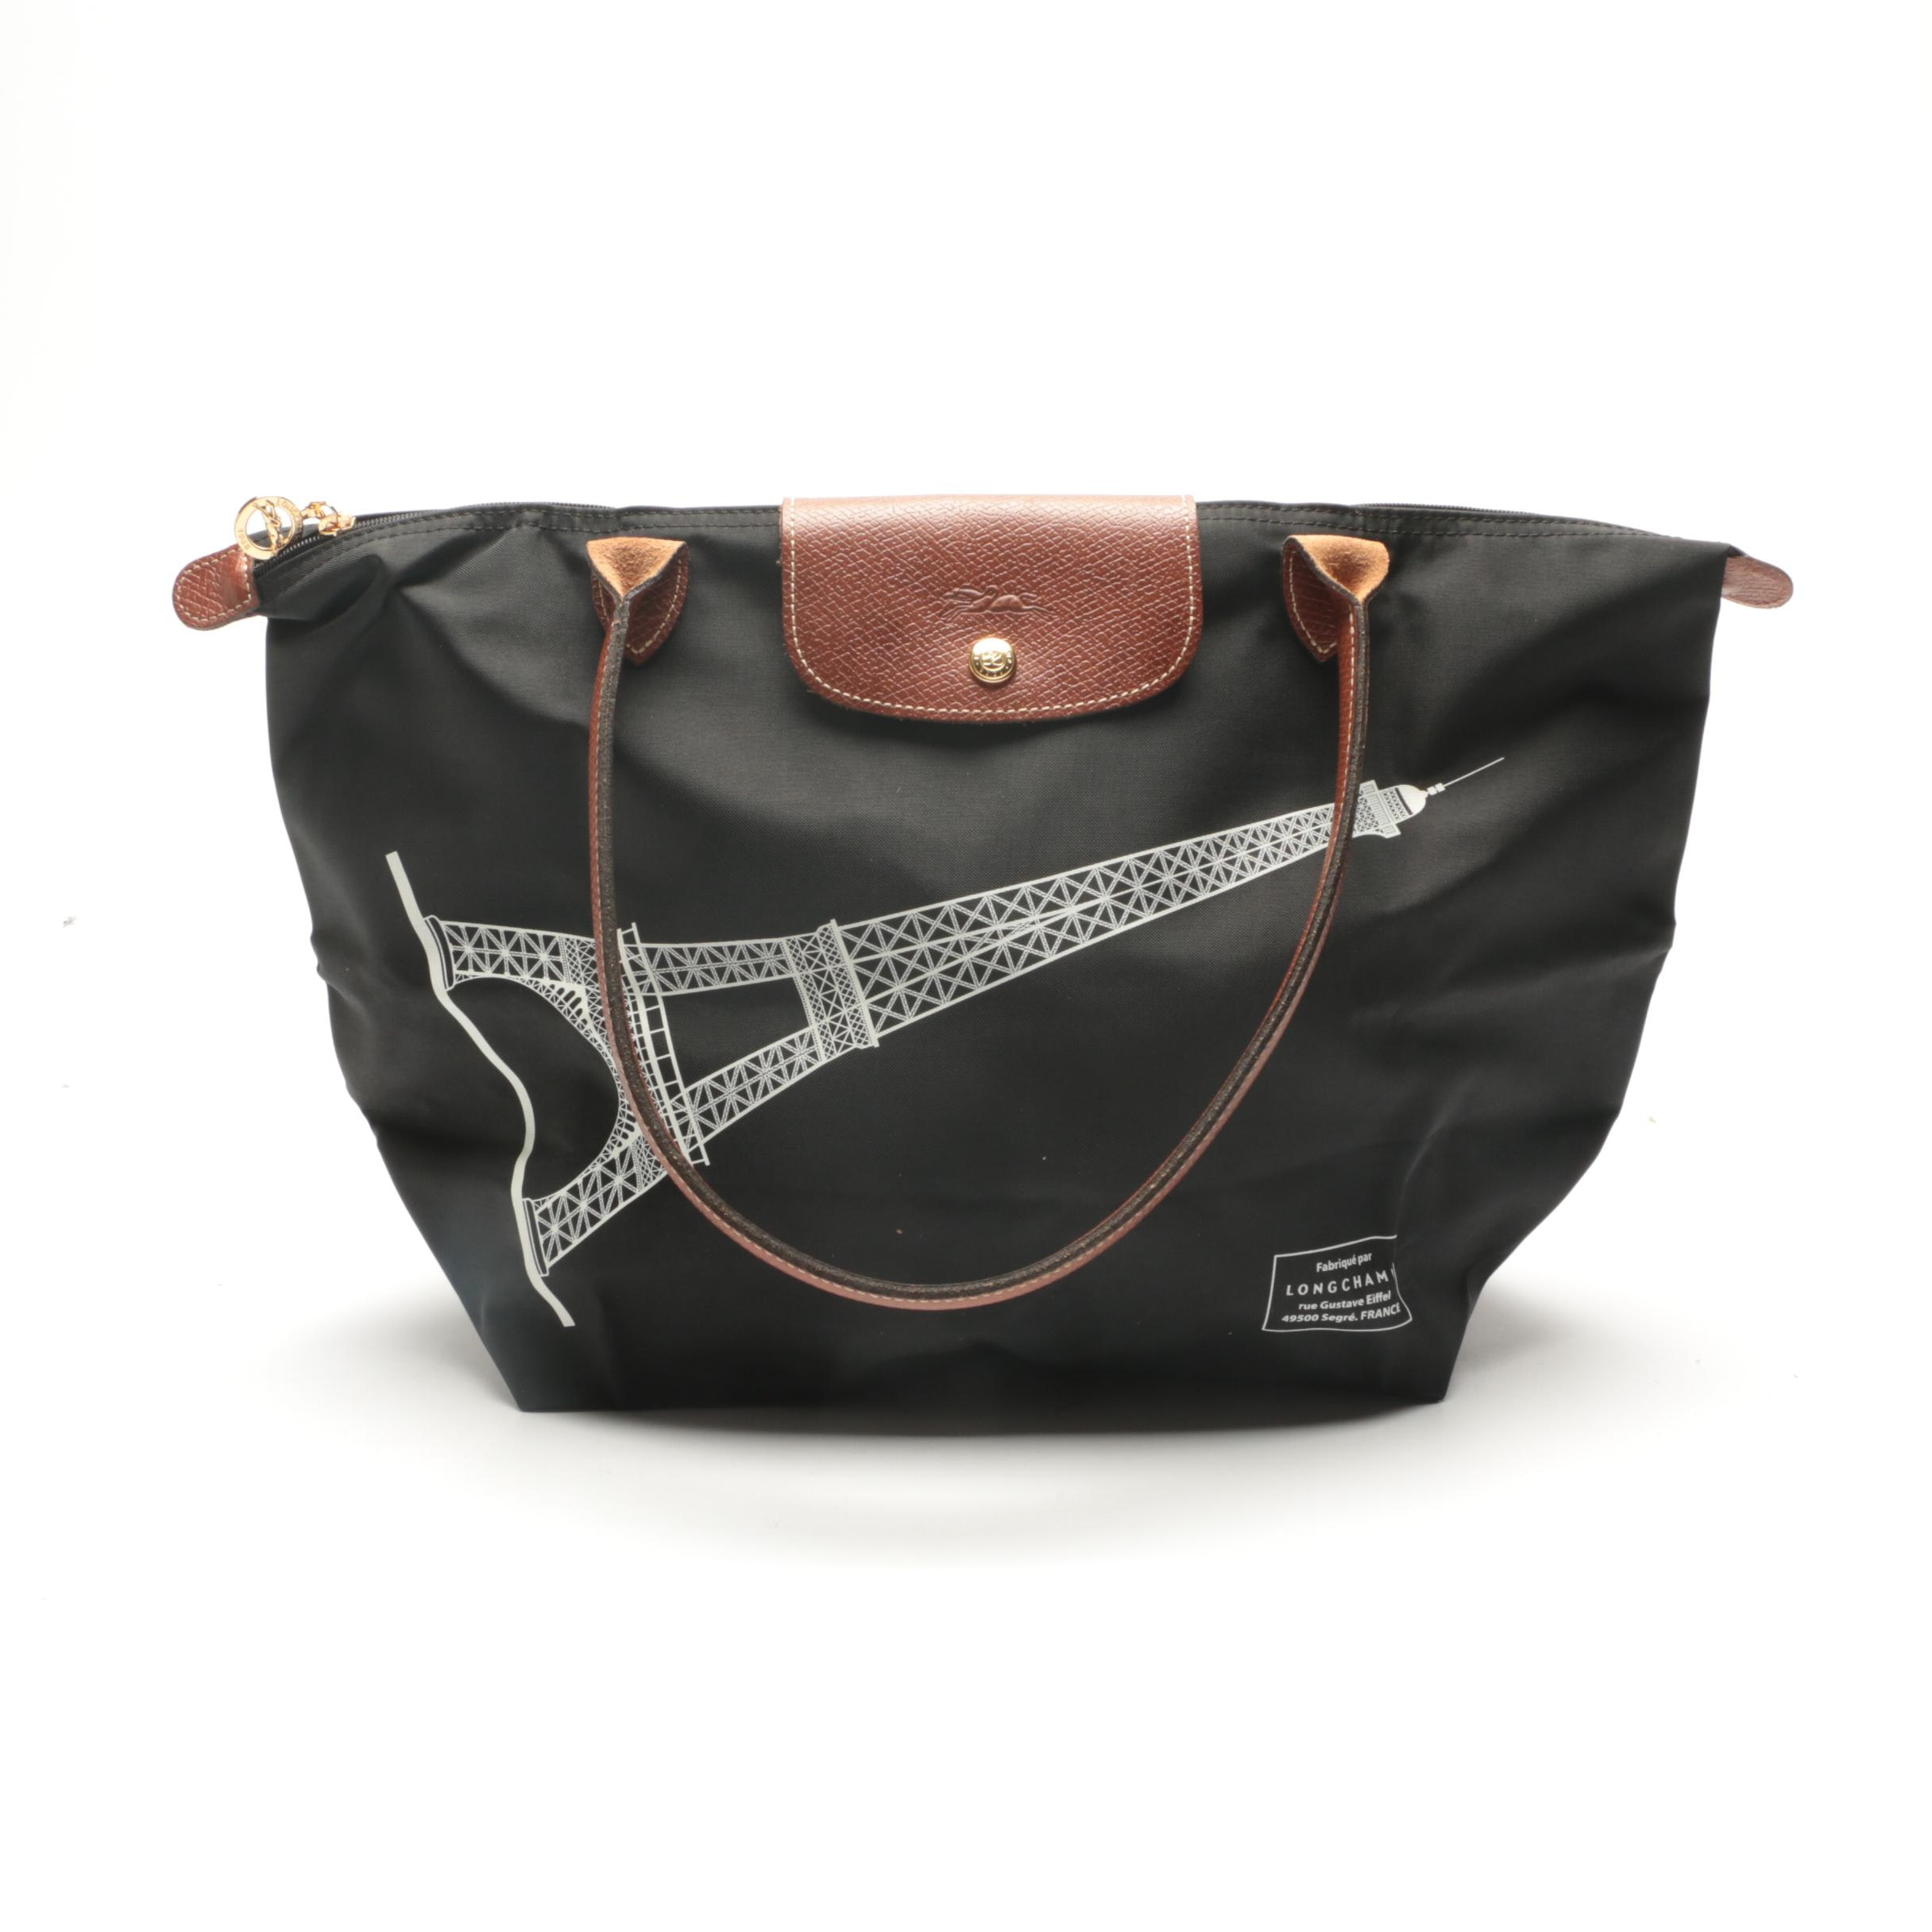 Longchamp Limited Edition Eiffel Tower Le Pliage Medium Tote Bag